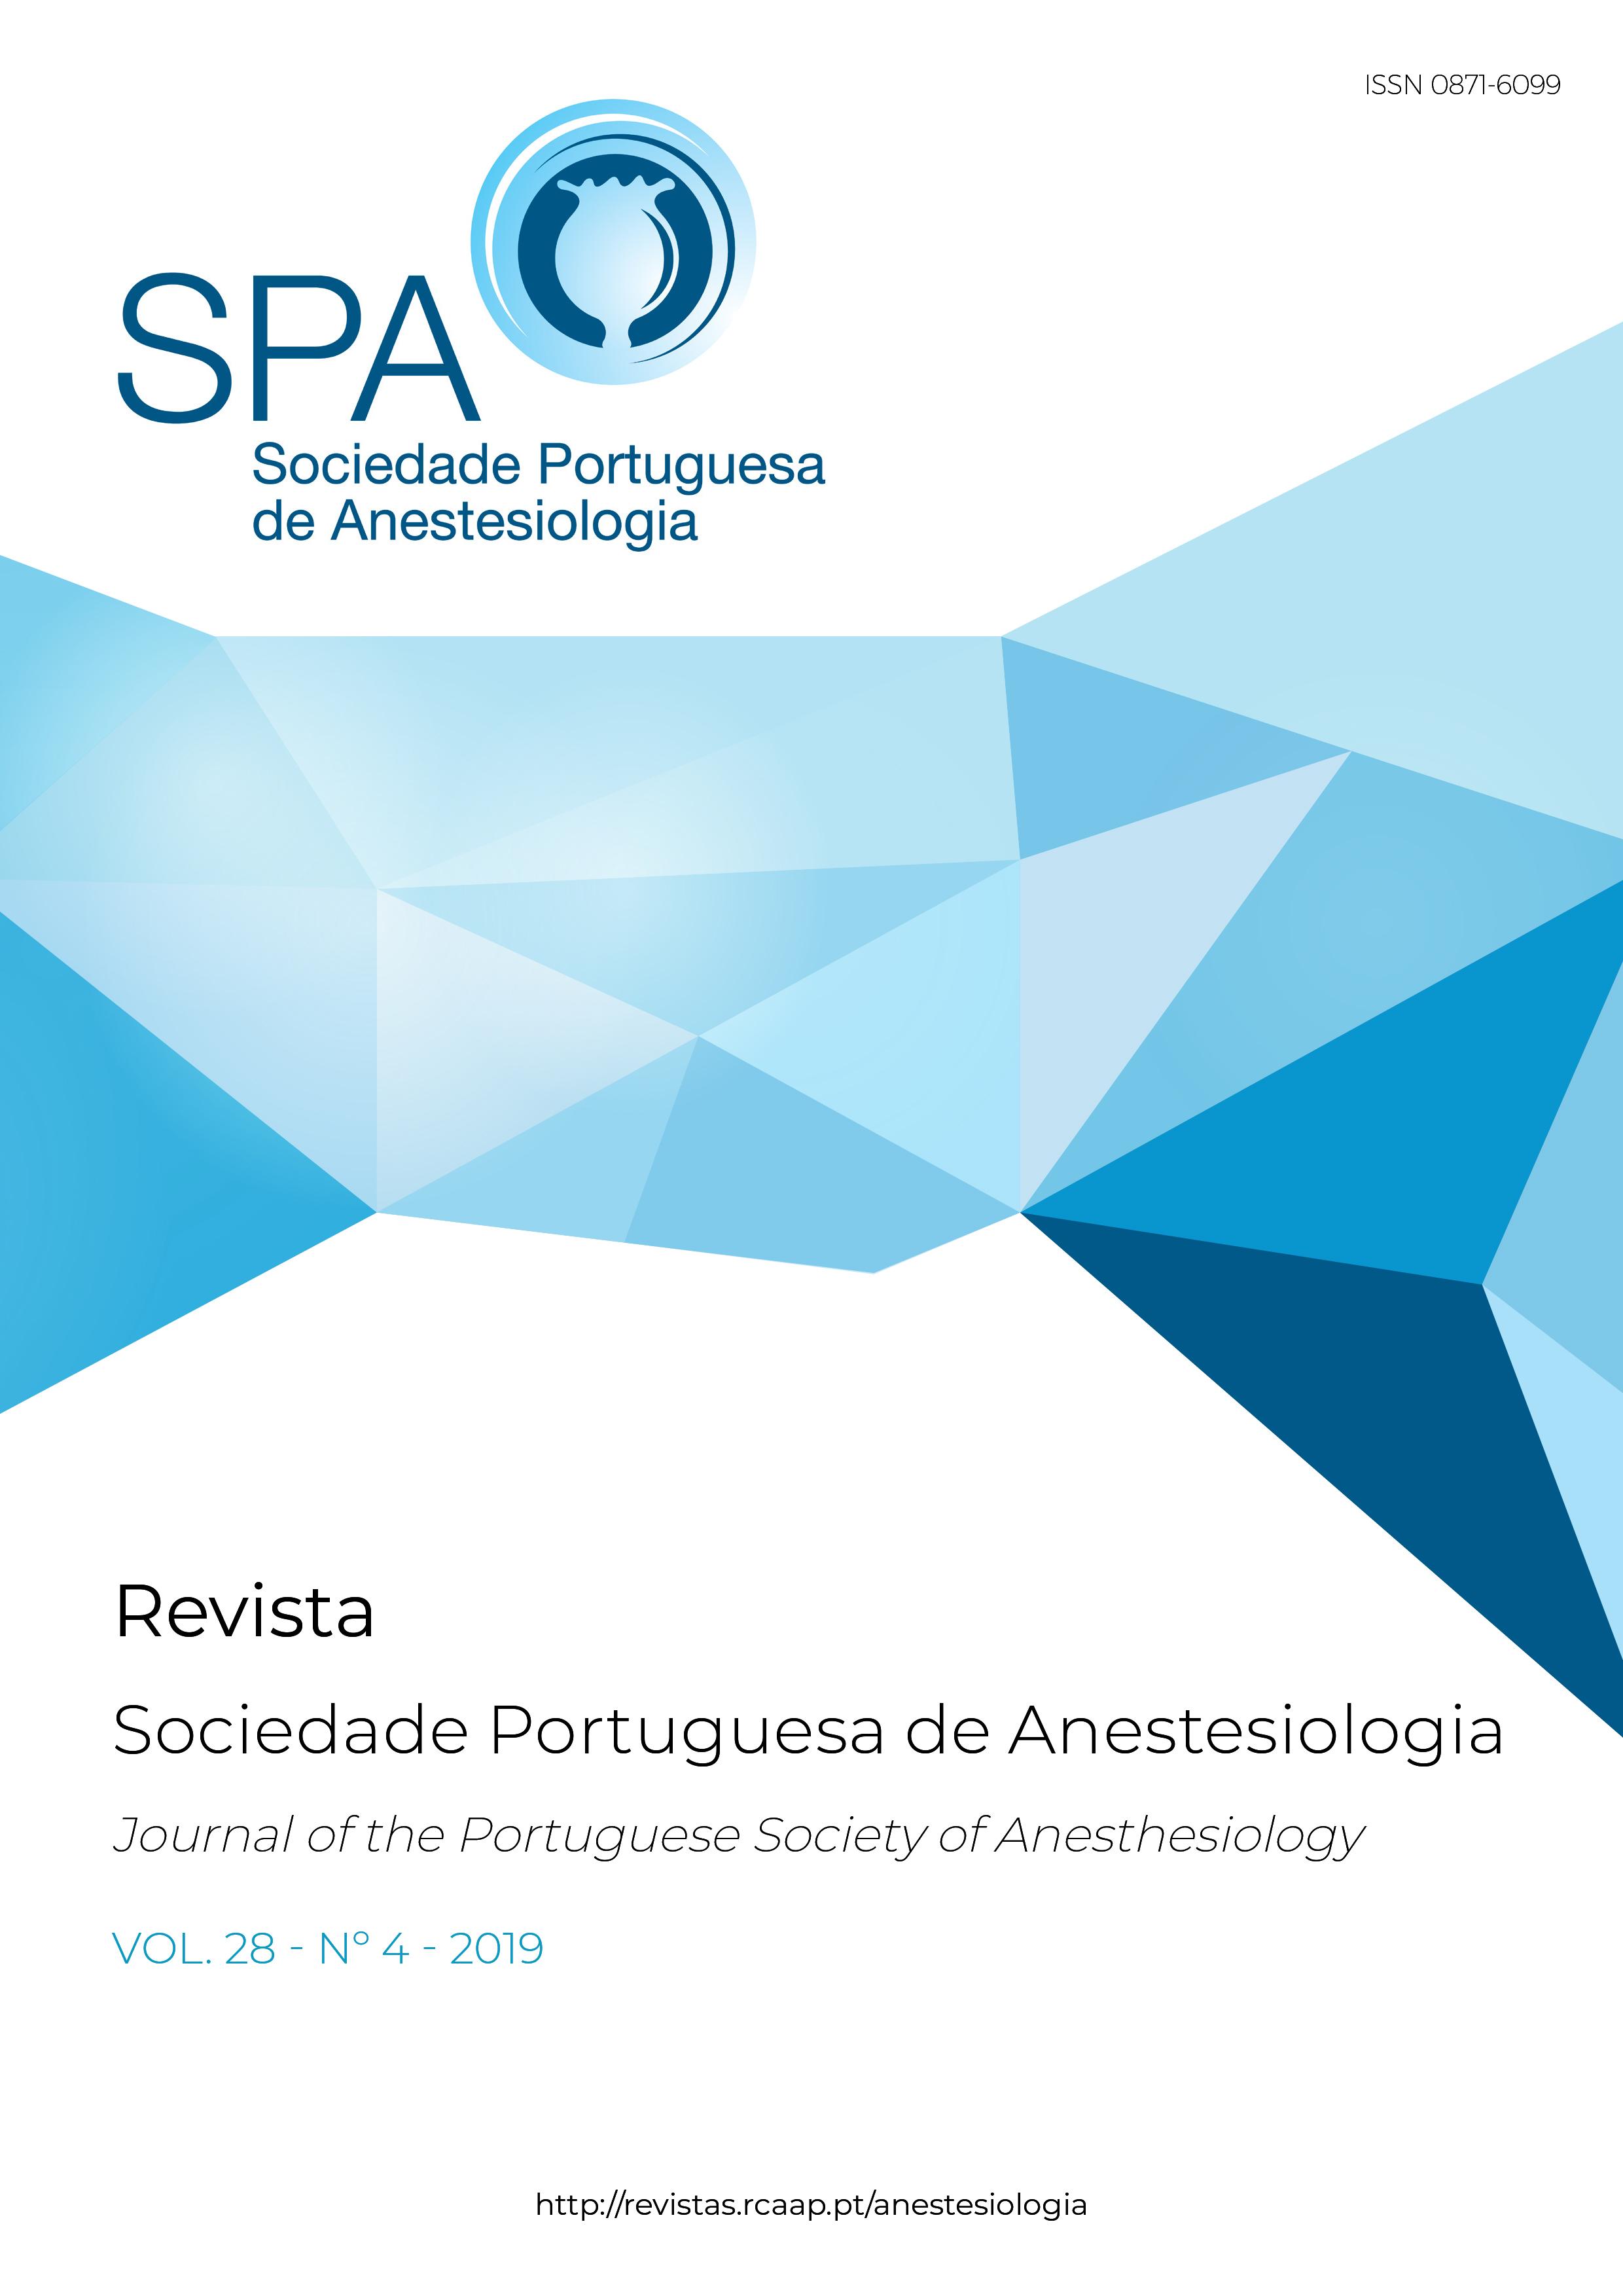 Ver Vol. 28 N.º 4 (2019): Revista da Sociedade Portuguesa de Anestesiologia